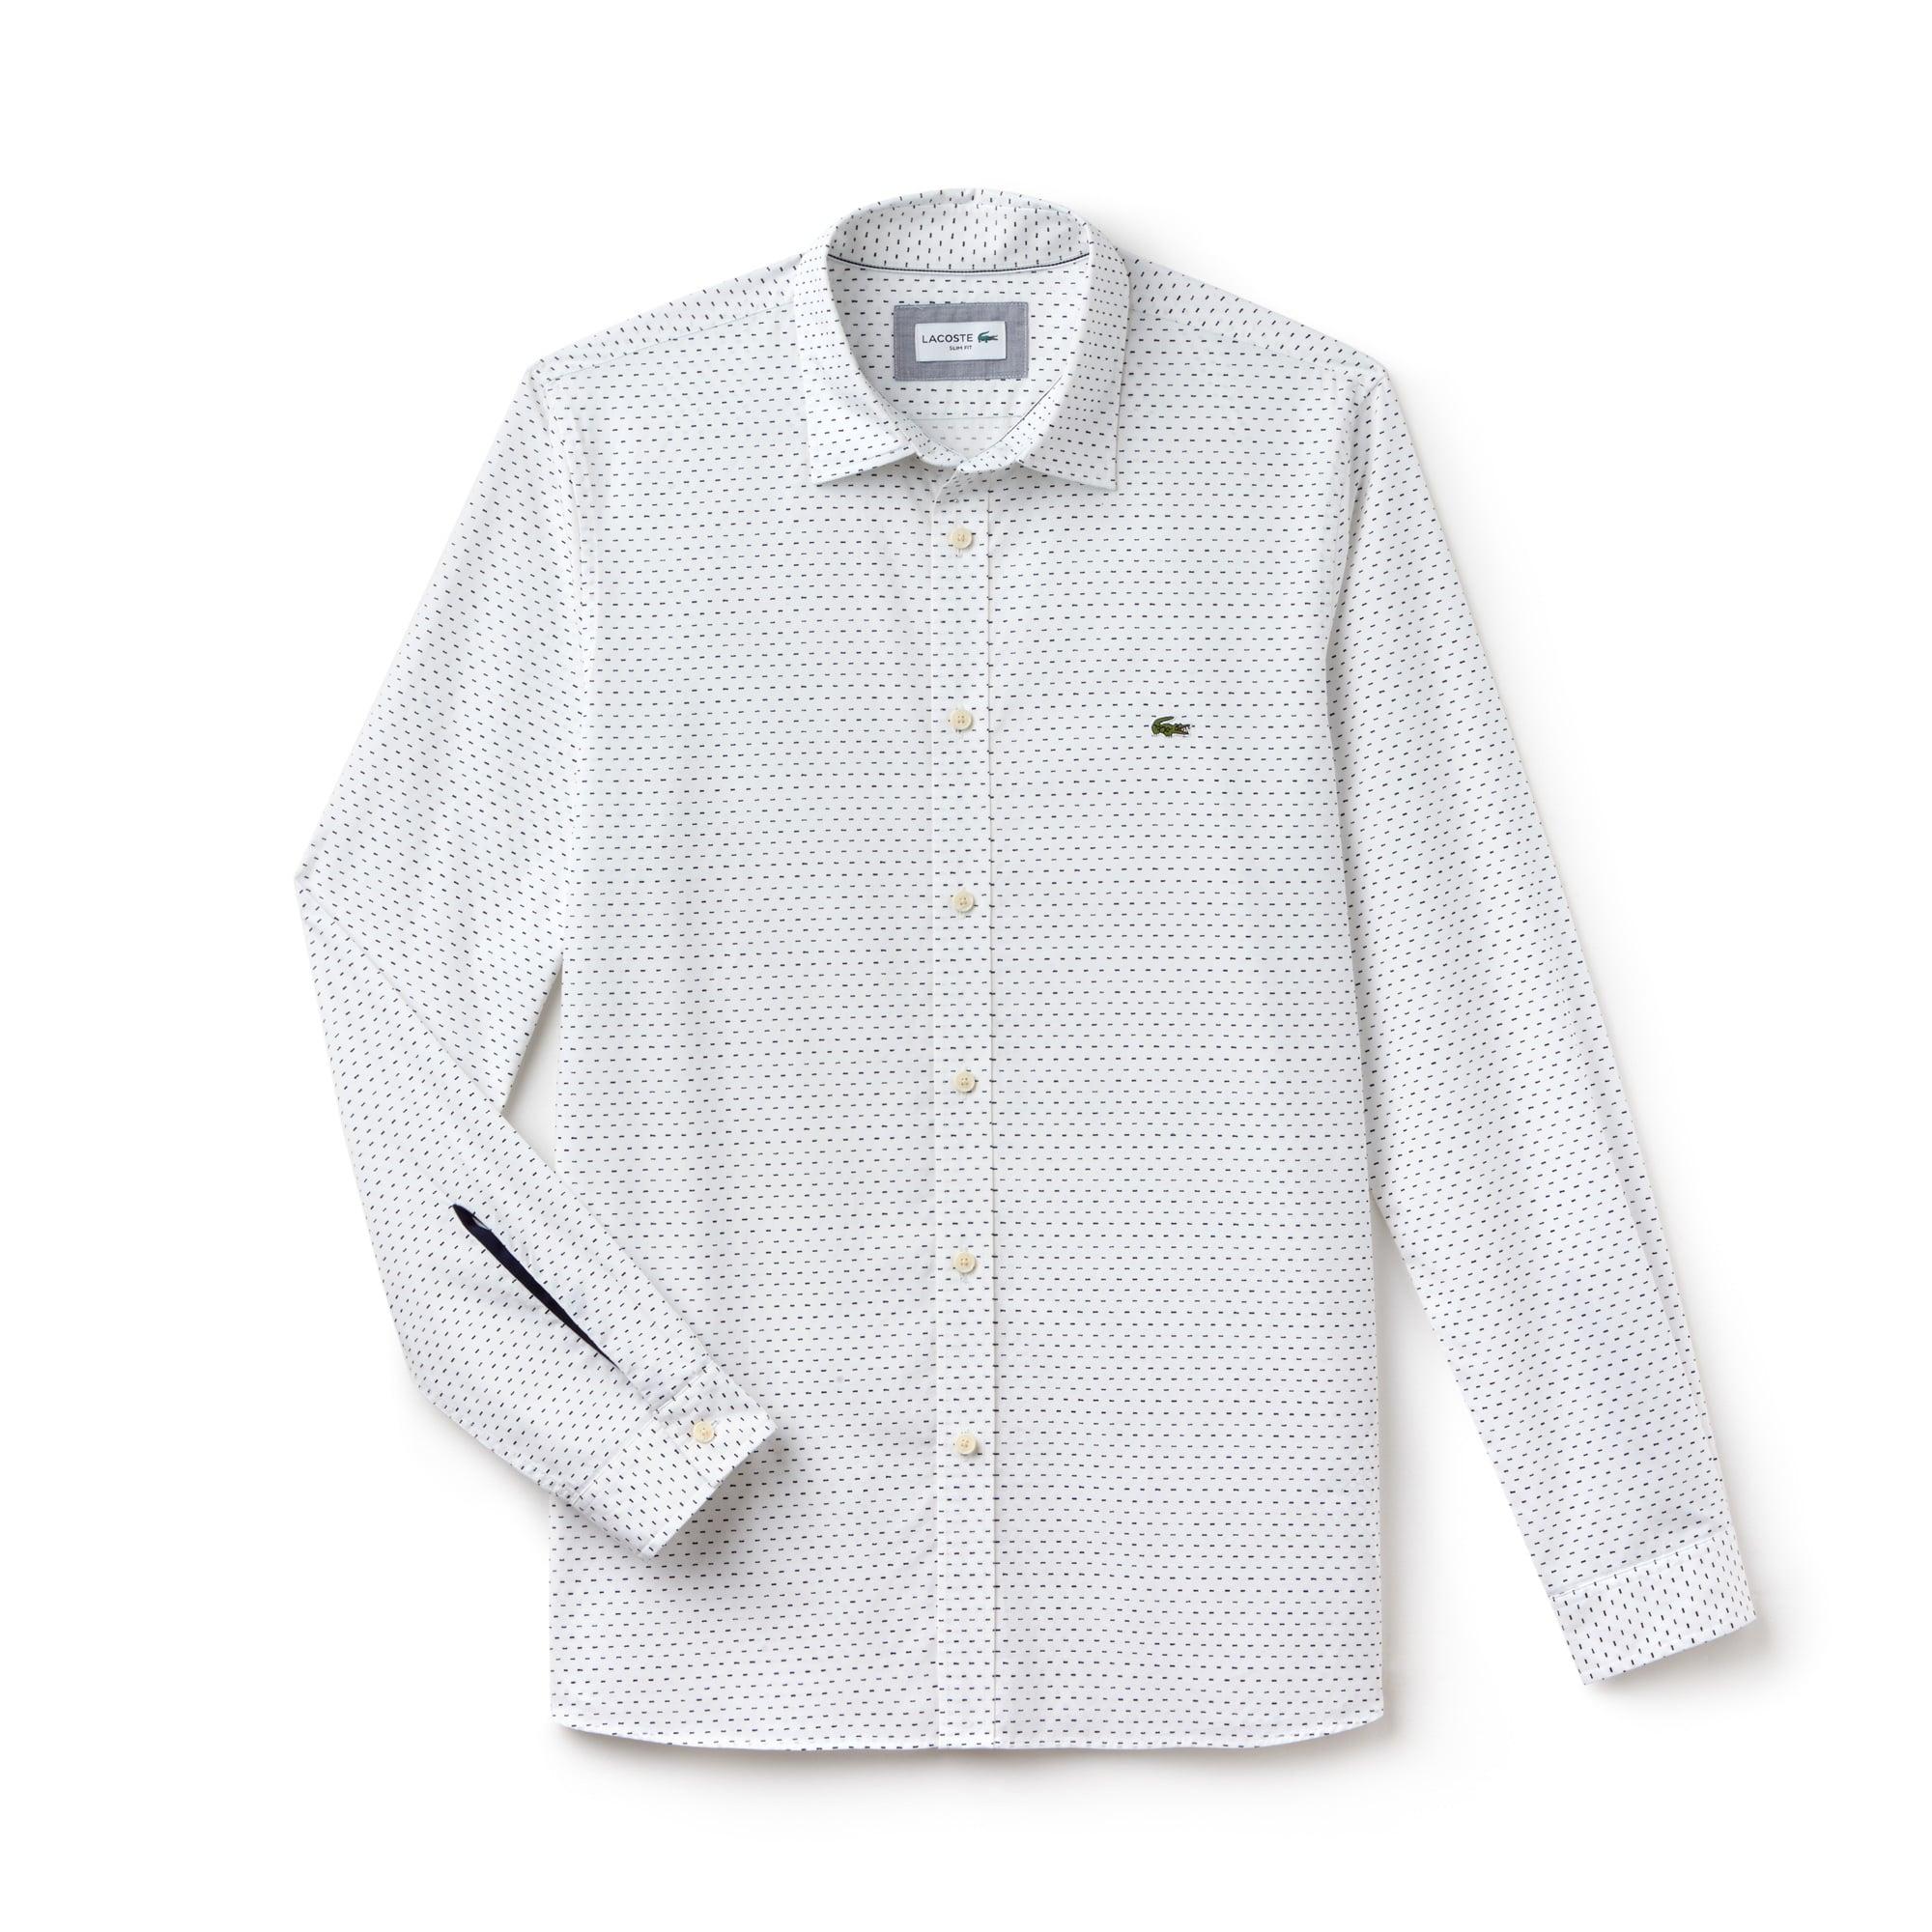 Herren Slim Fit Hemd aus bedruckter Popeline LACOSTE MOTION